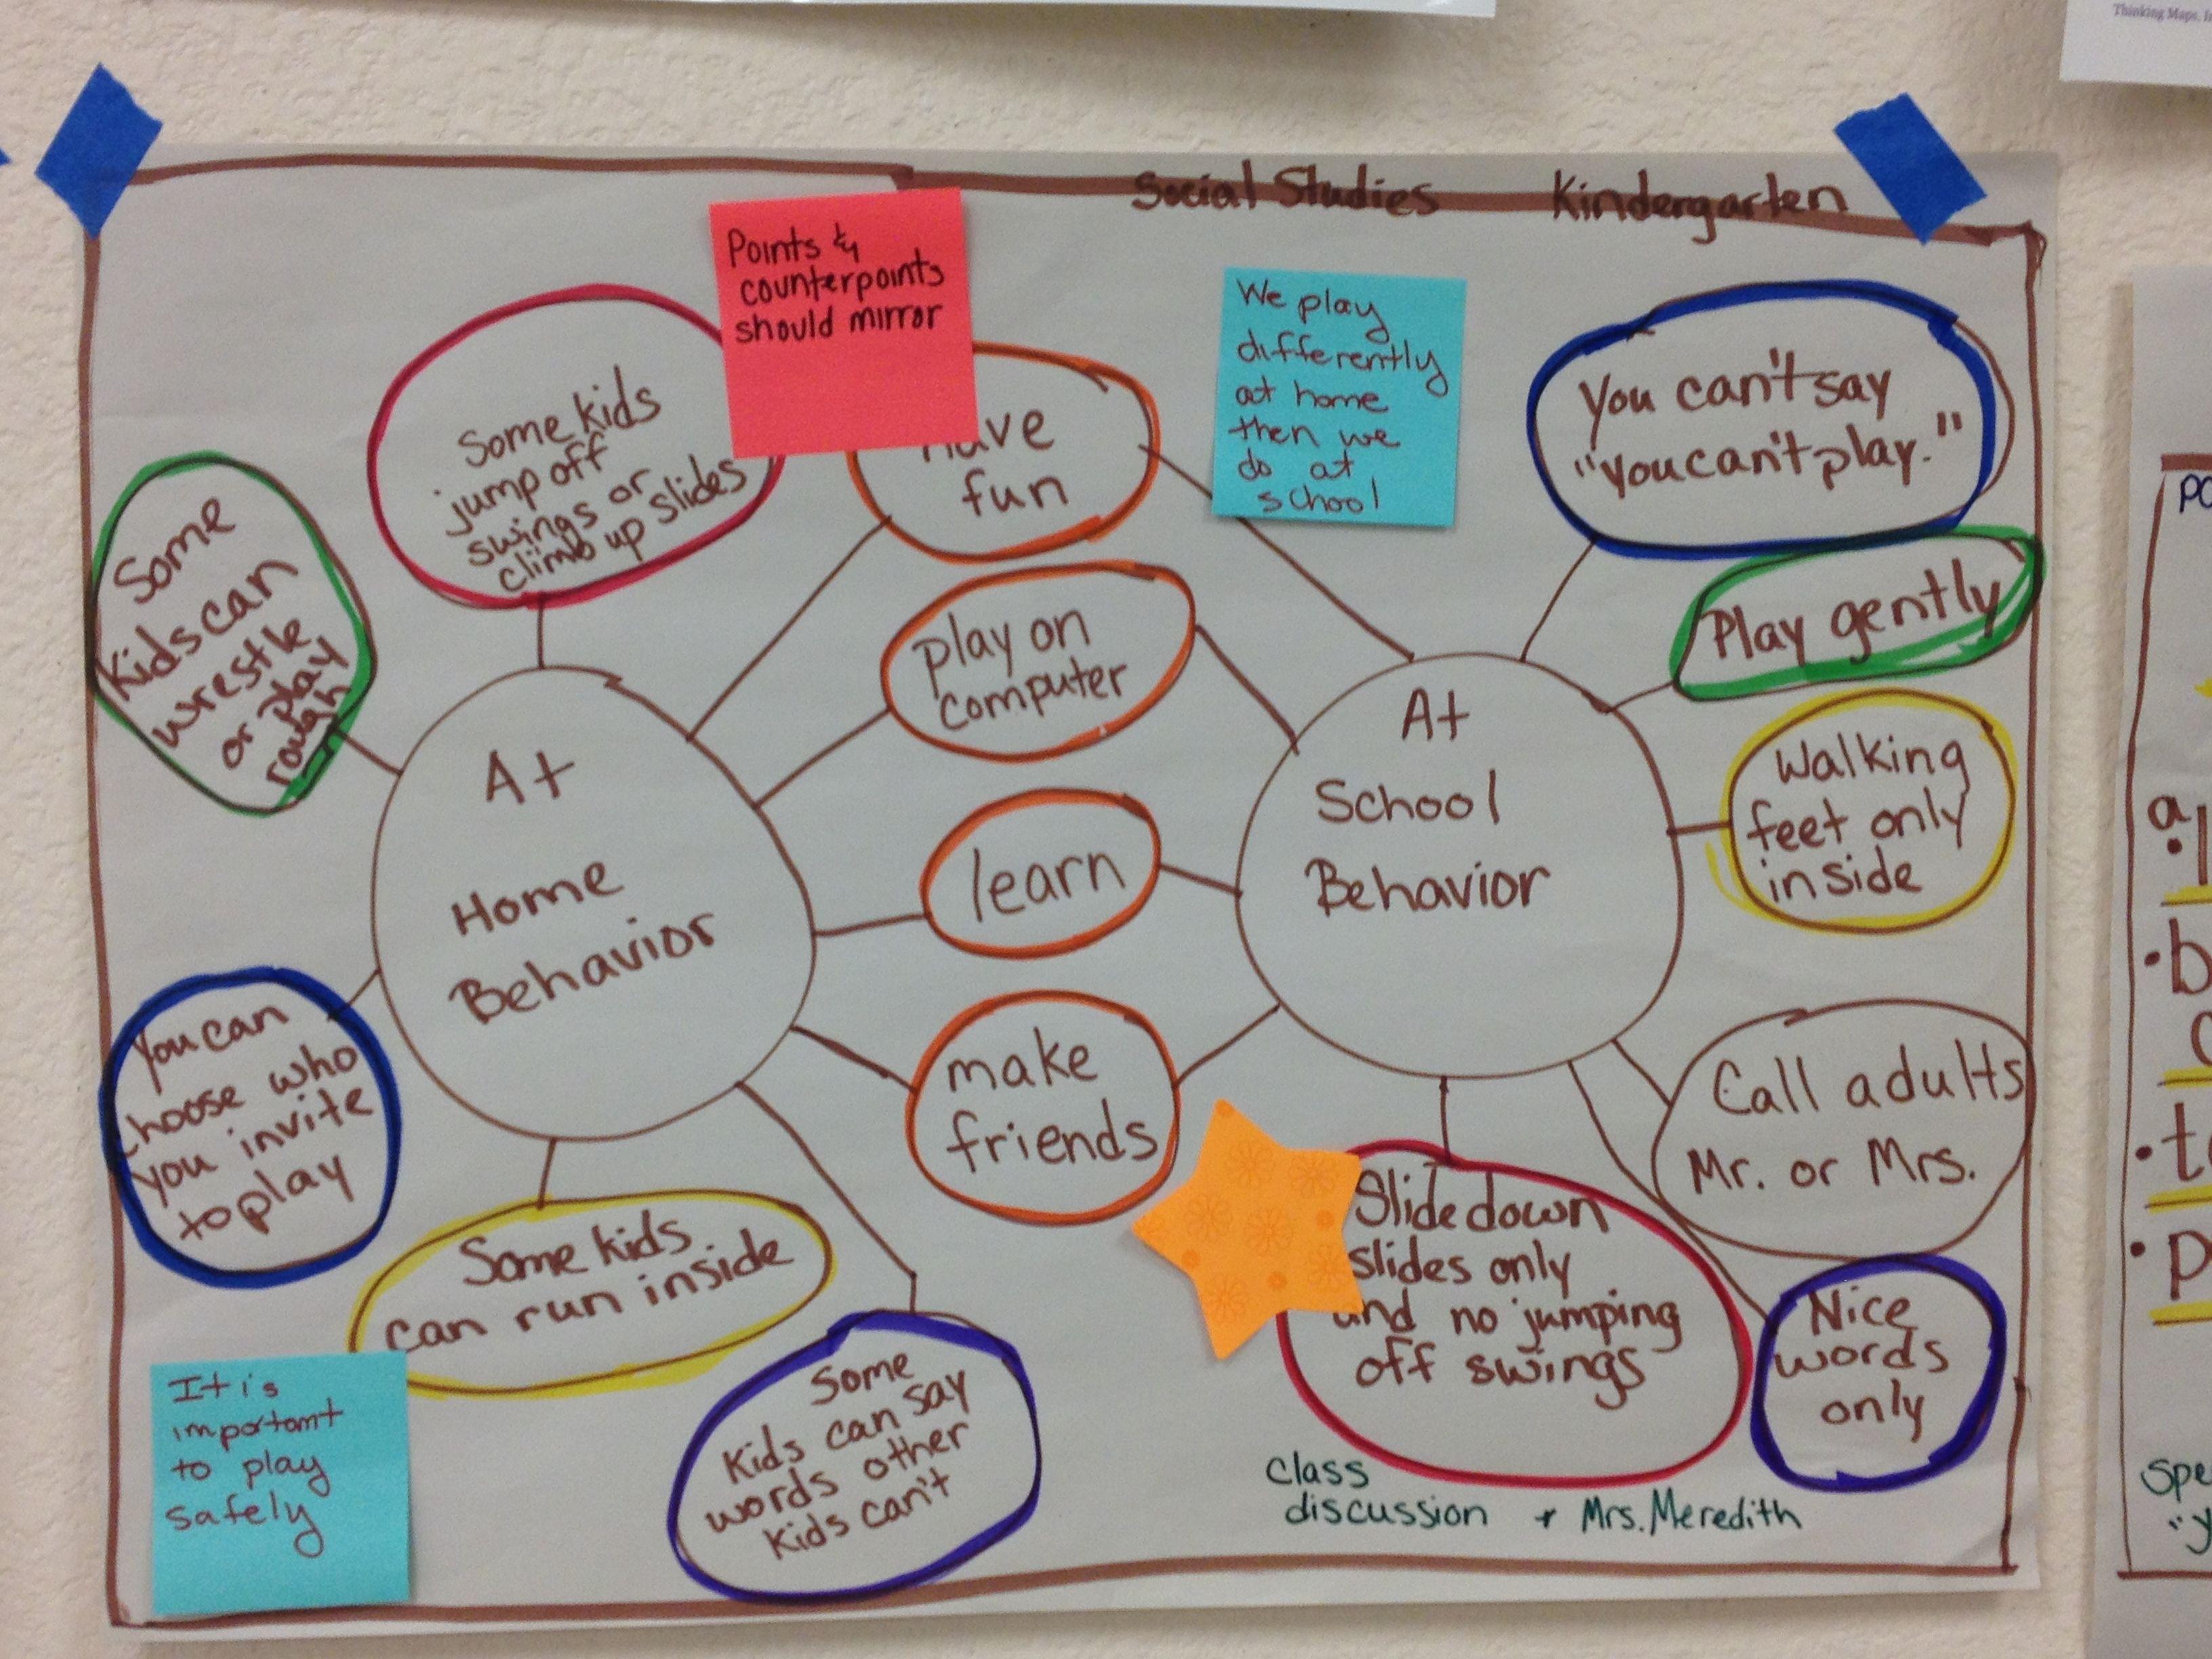 School Behavior Vs Home Behavior Compare And Contrast